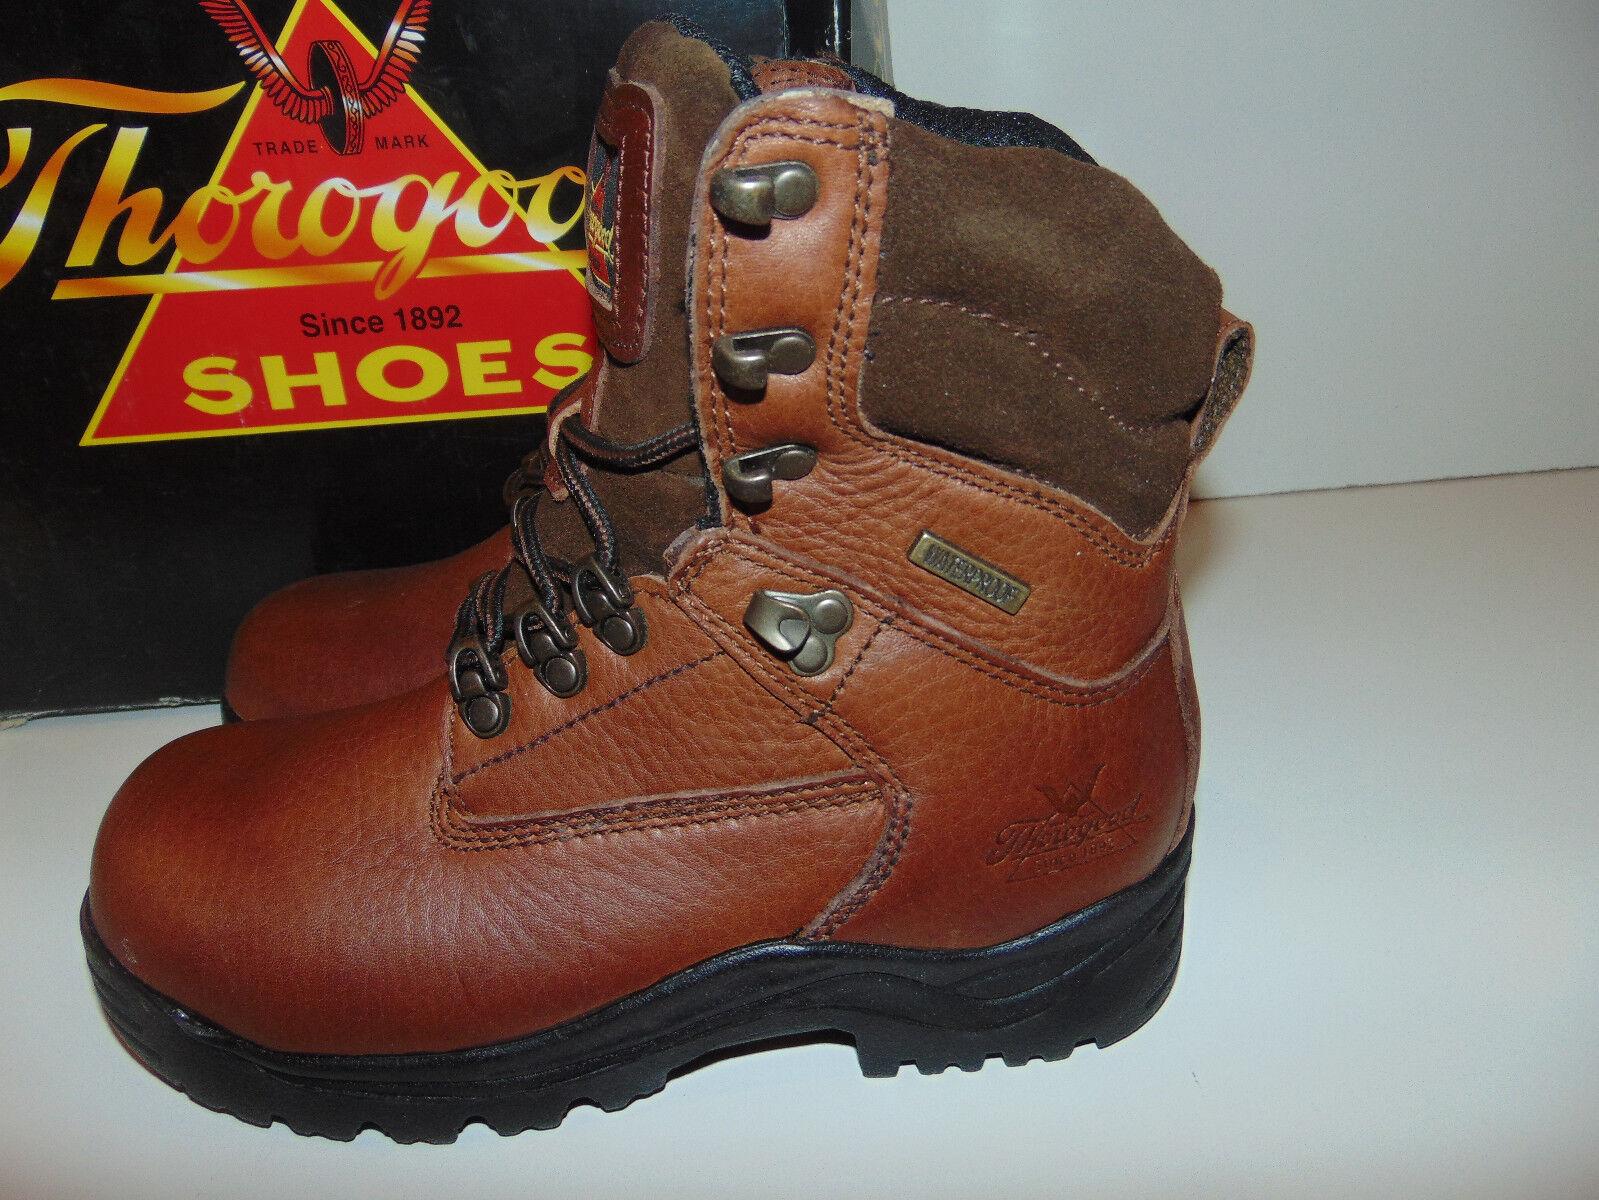 Thorogood Impermeable Para Hombre M Marrón Botas Deporte 804-4908 Nuevo Composite Toe Nuevo 804-4908 19f1b0